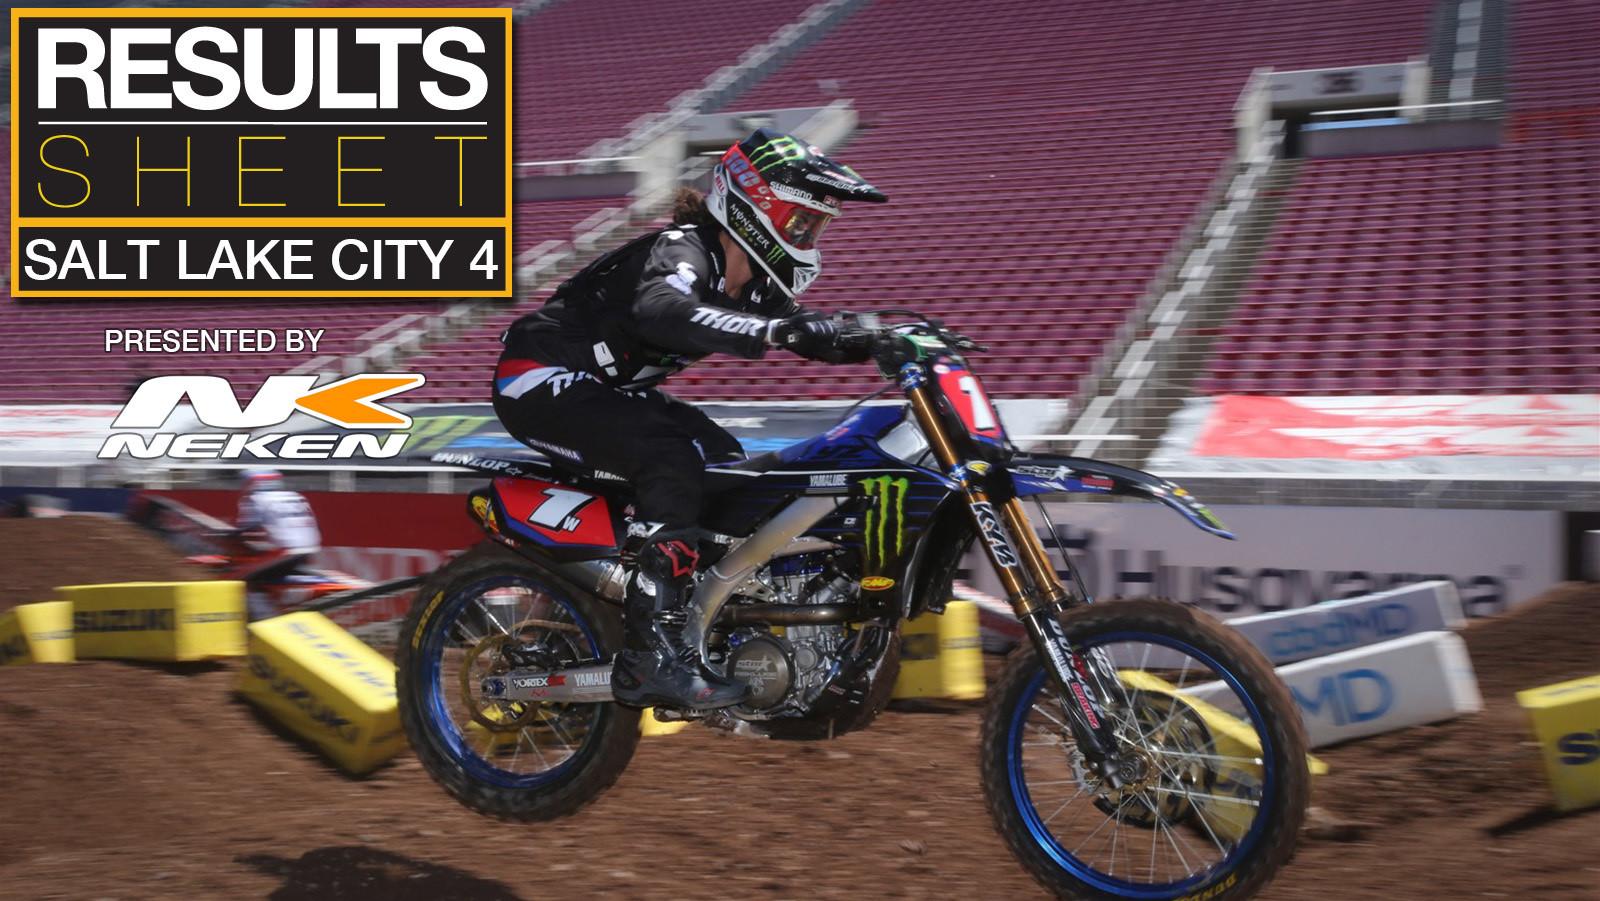 Results Sheet: 2020 Salt Lake City 4 Supercross